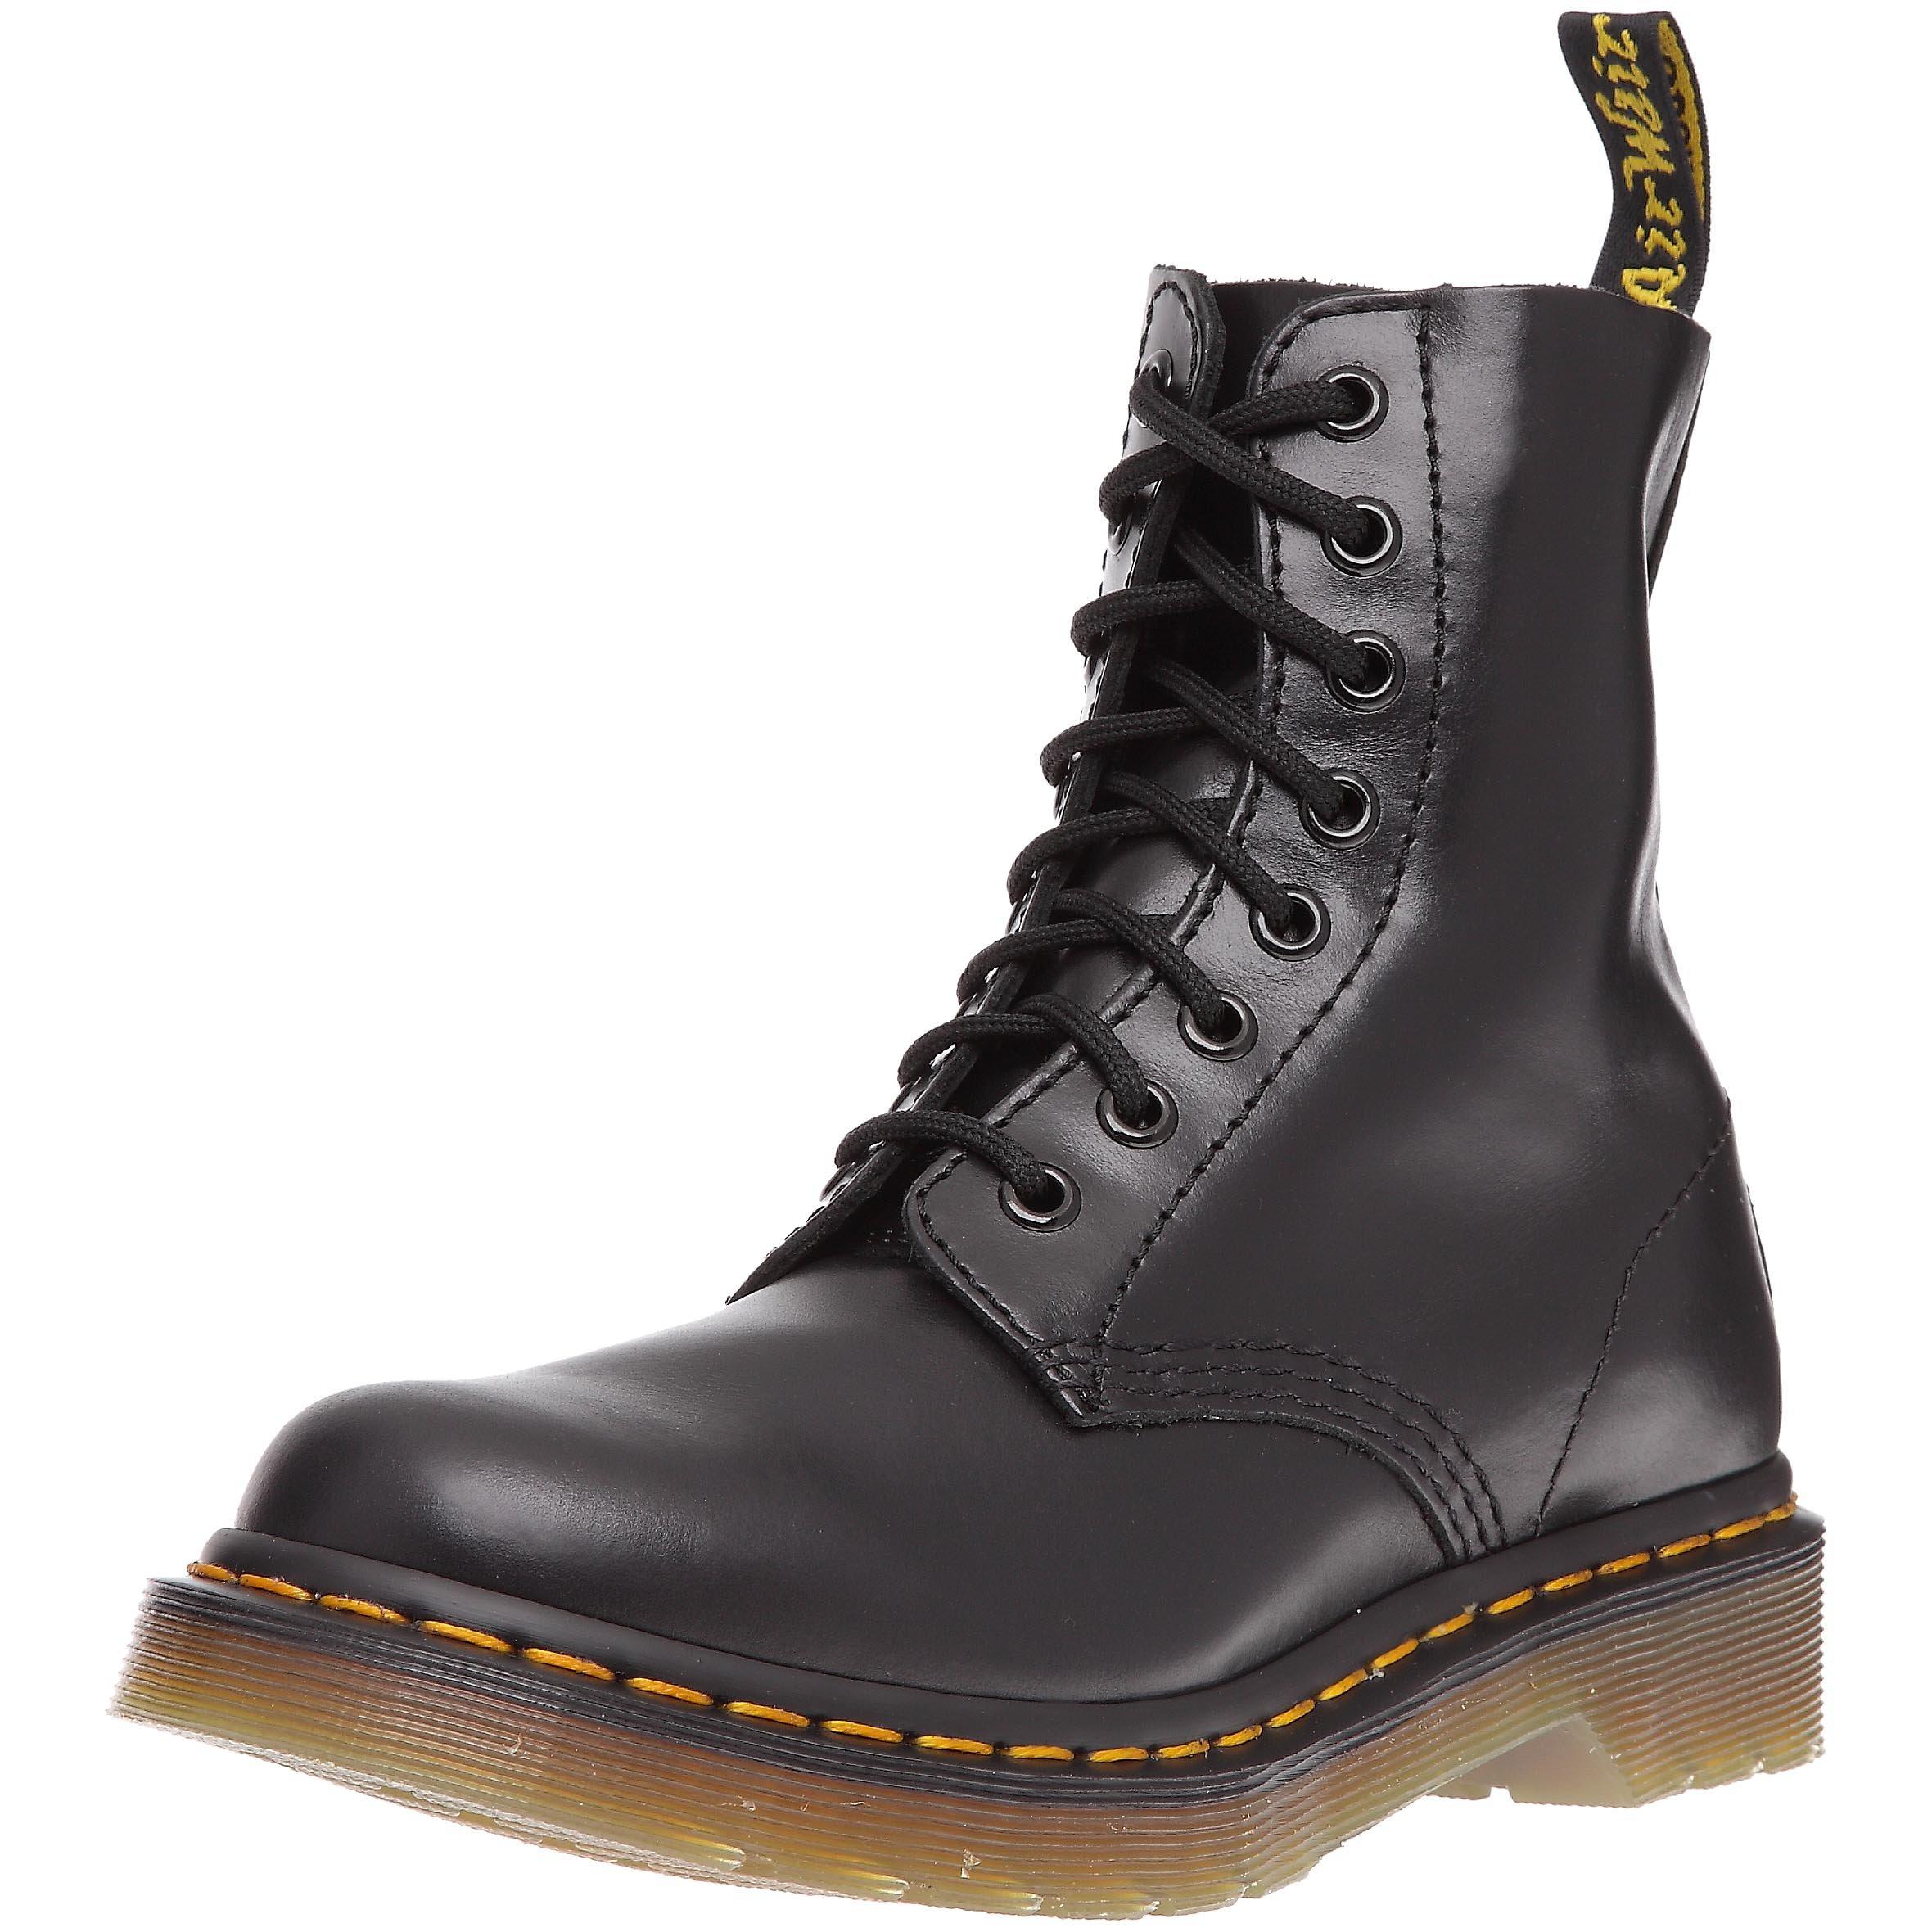 Dr. Martens Women's Pascal Boot,Black Buttero,8 UK/10 M US by Dr. Martens